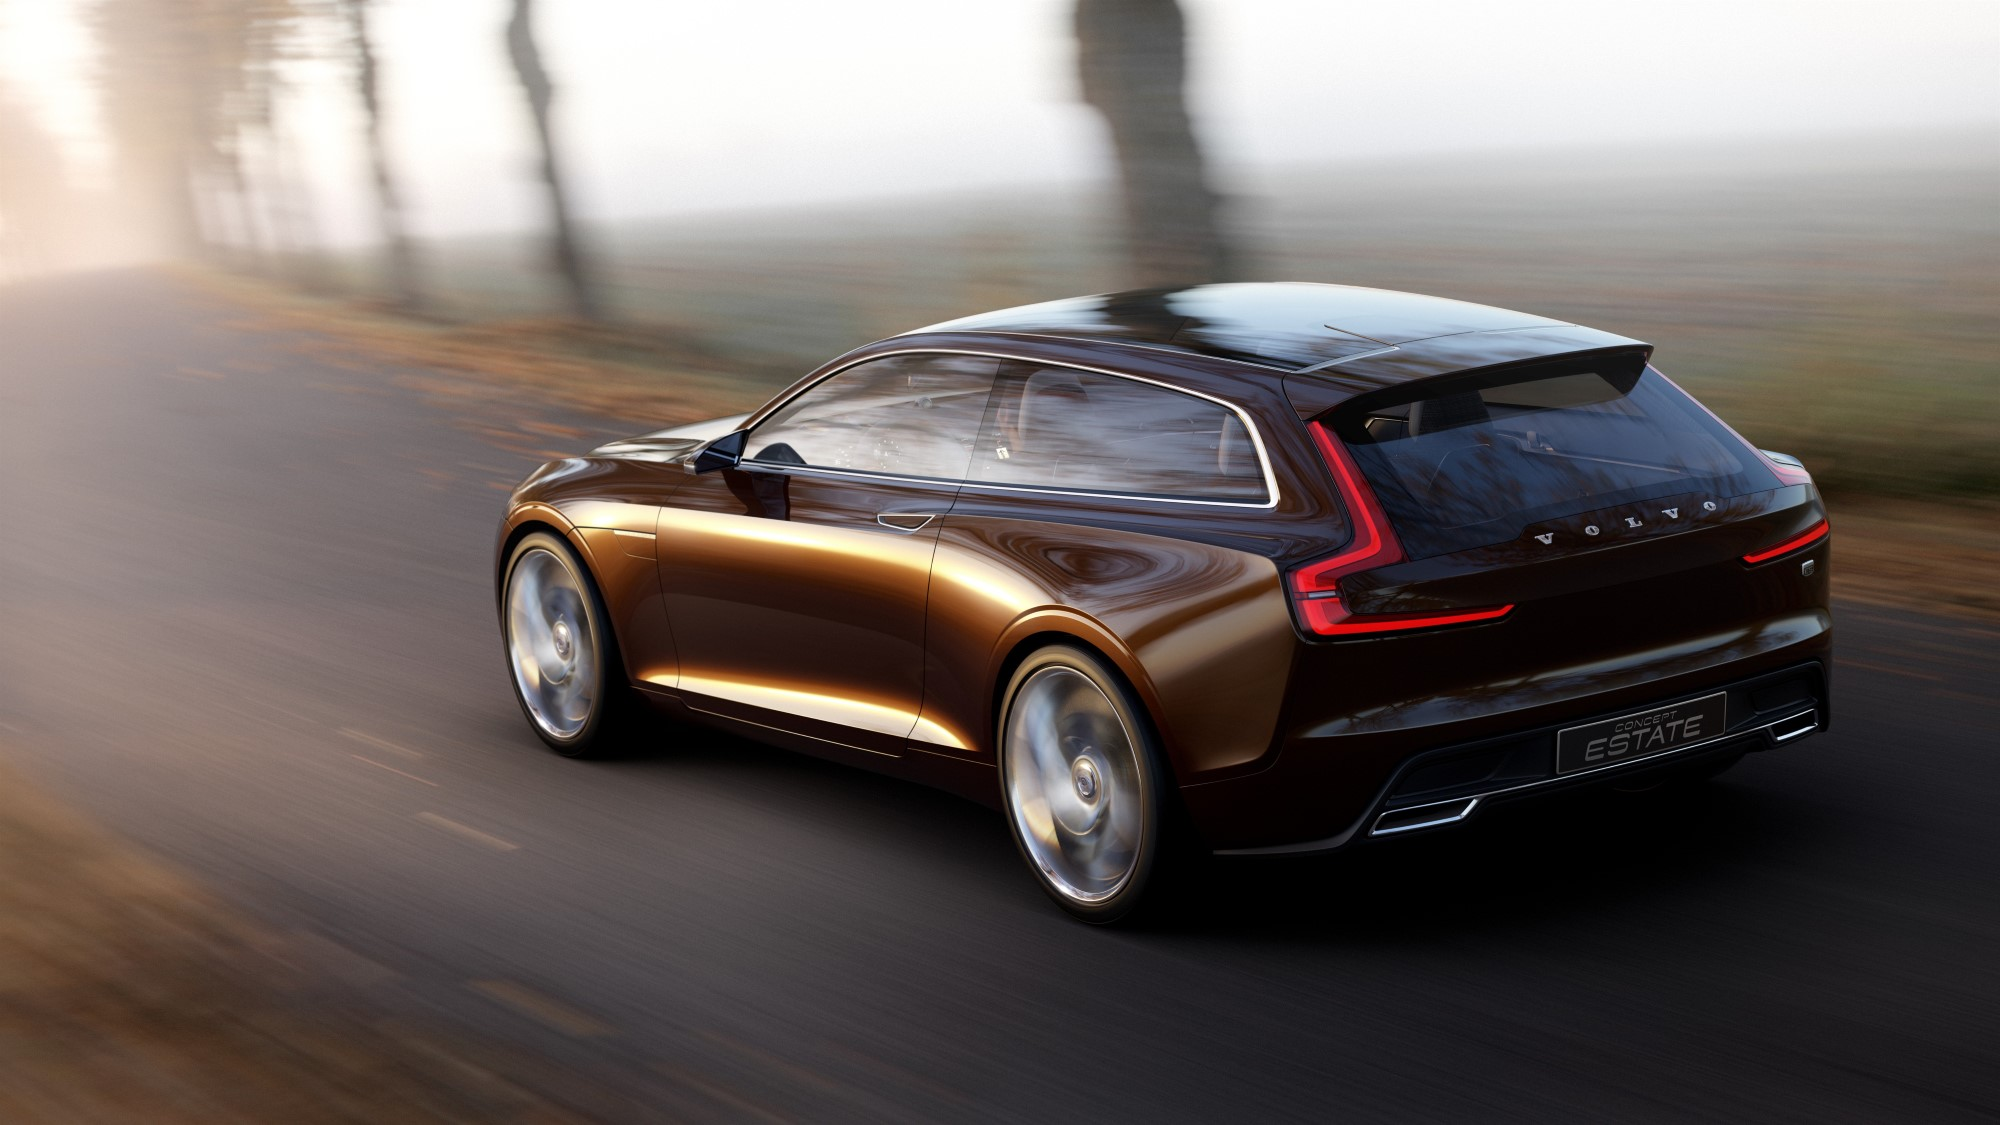 Volvo Concept Estate To Spawn V90 Luxury Wagon: Report